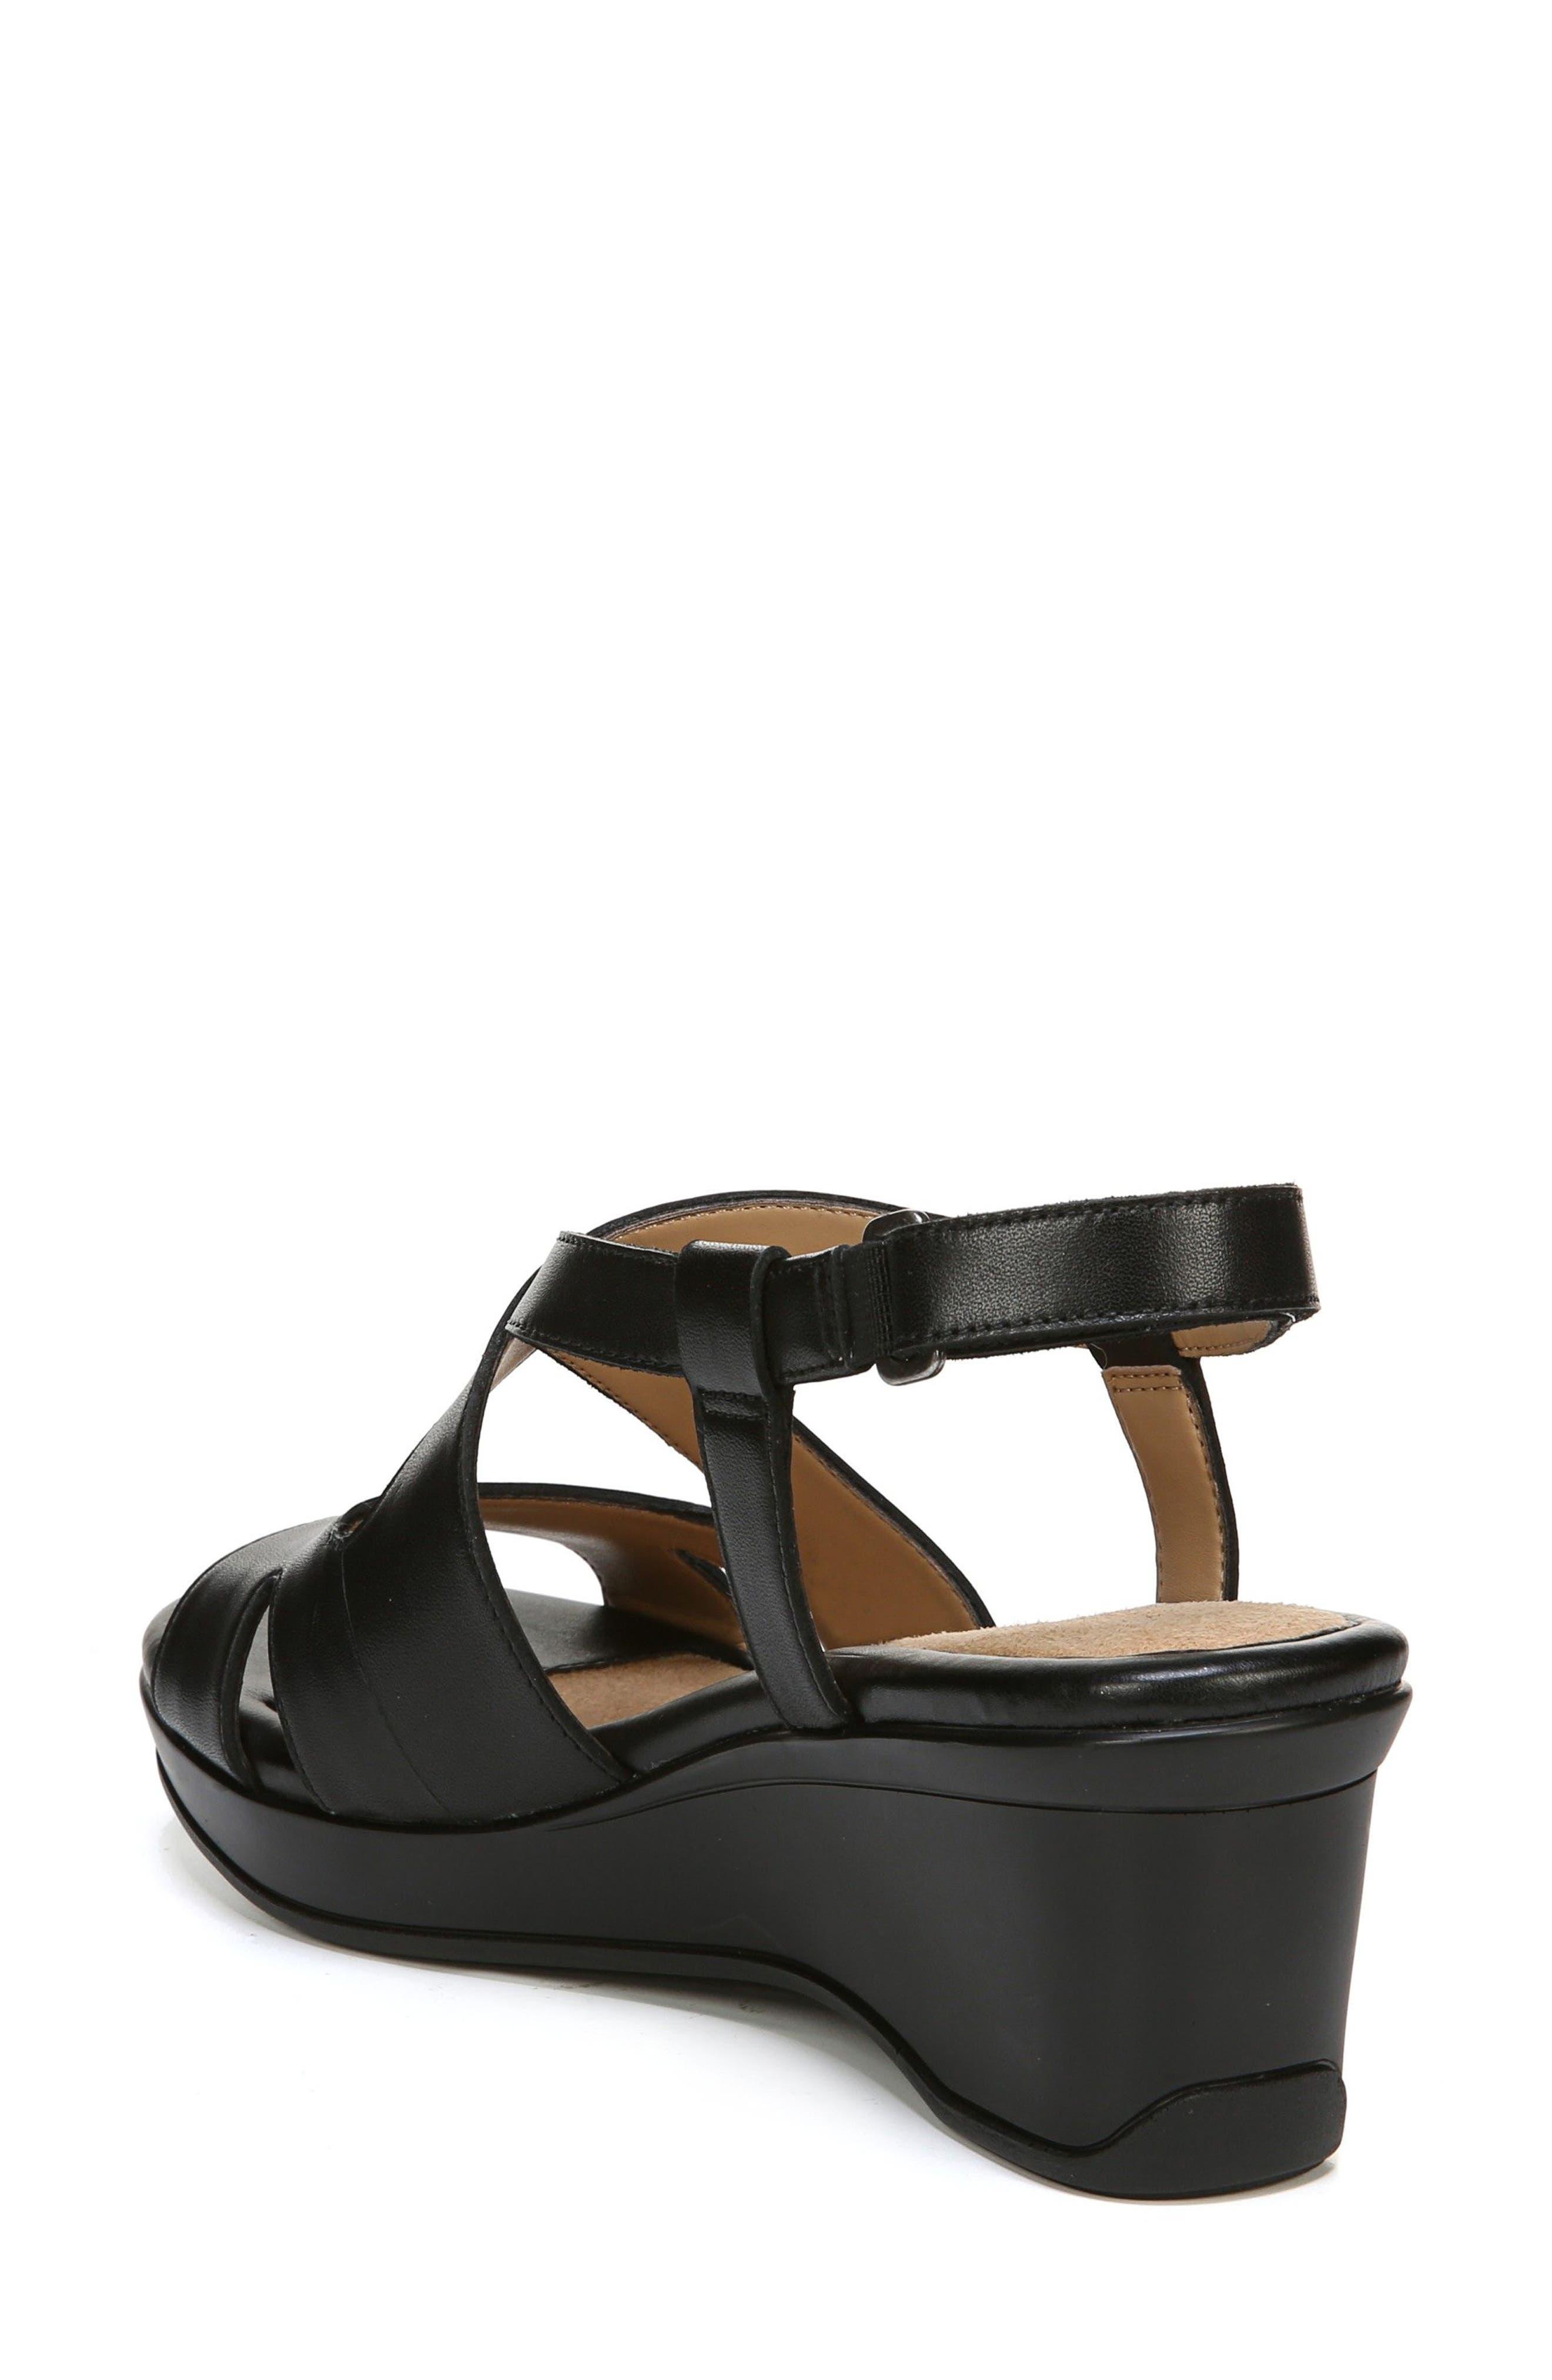 Vilette Wedge Sandal,                             Alternate thumbnail 2, color,                             Black Leather